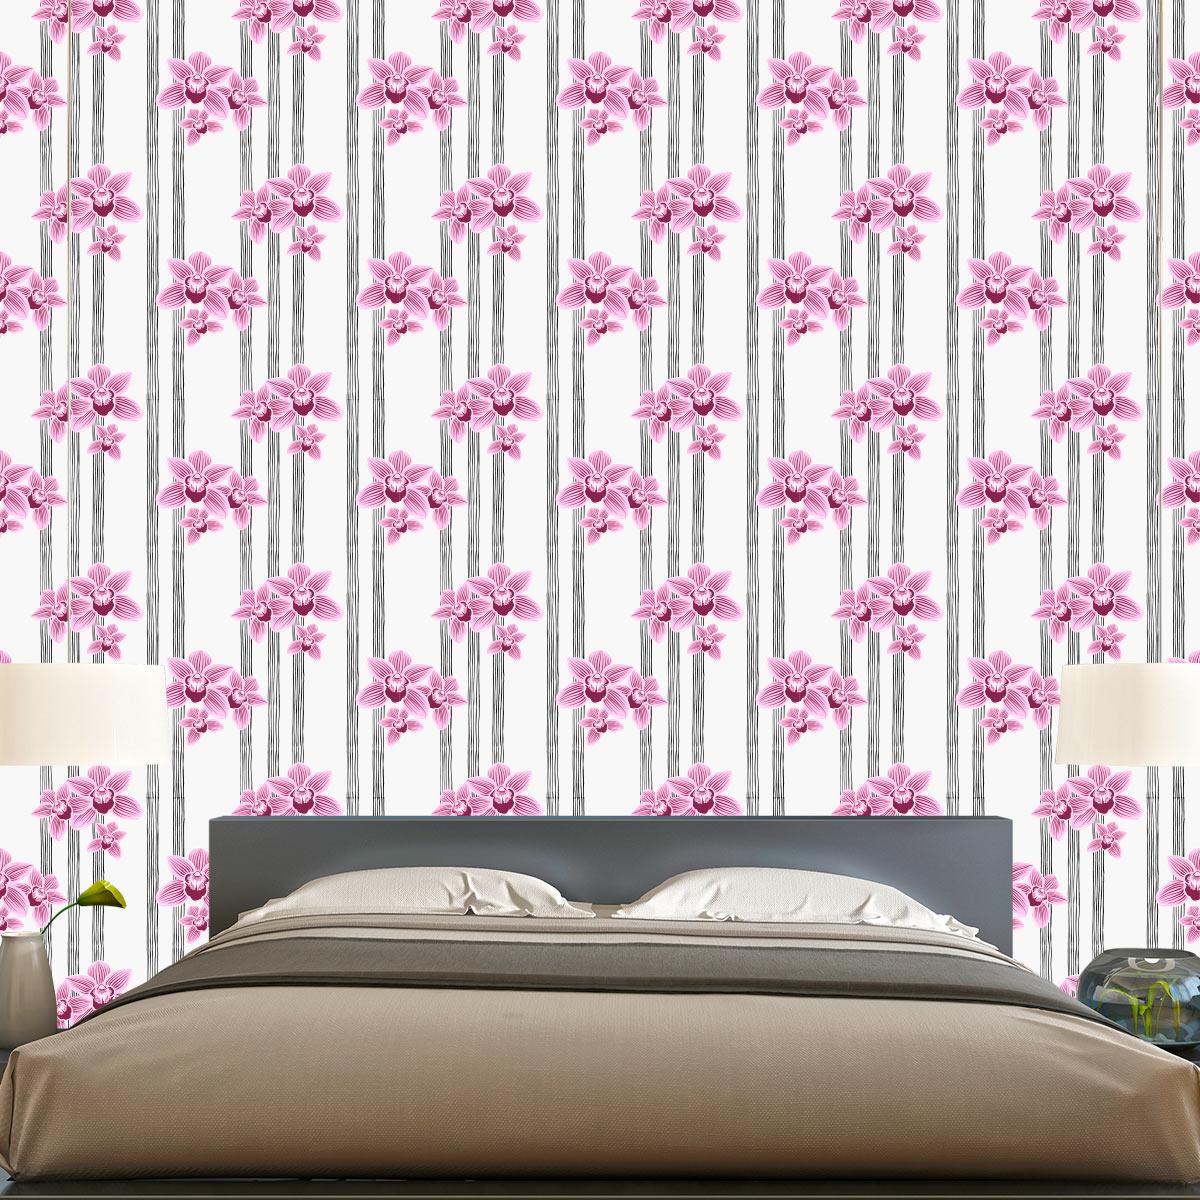 Papel de Parede Listrado Floral Rosa Luxo Adesivo